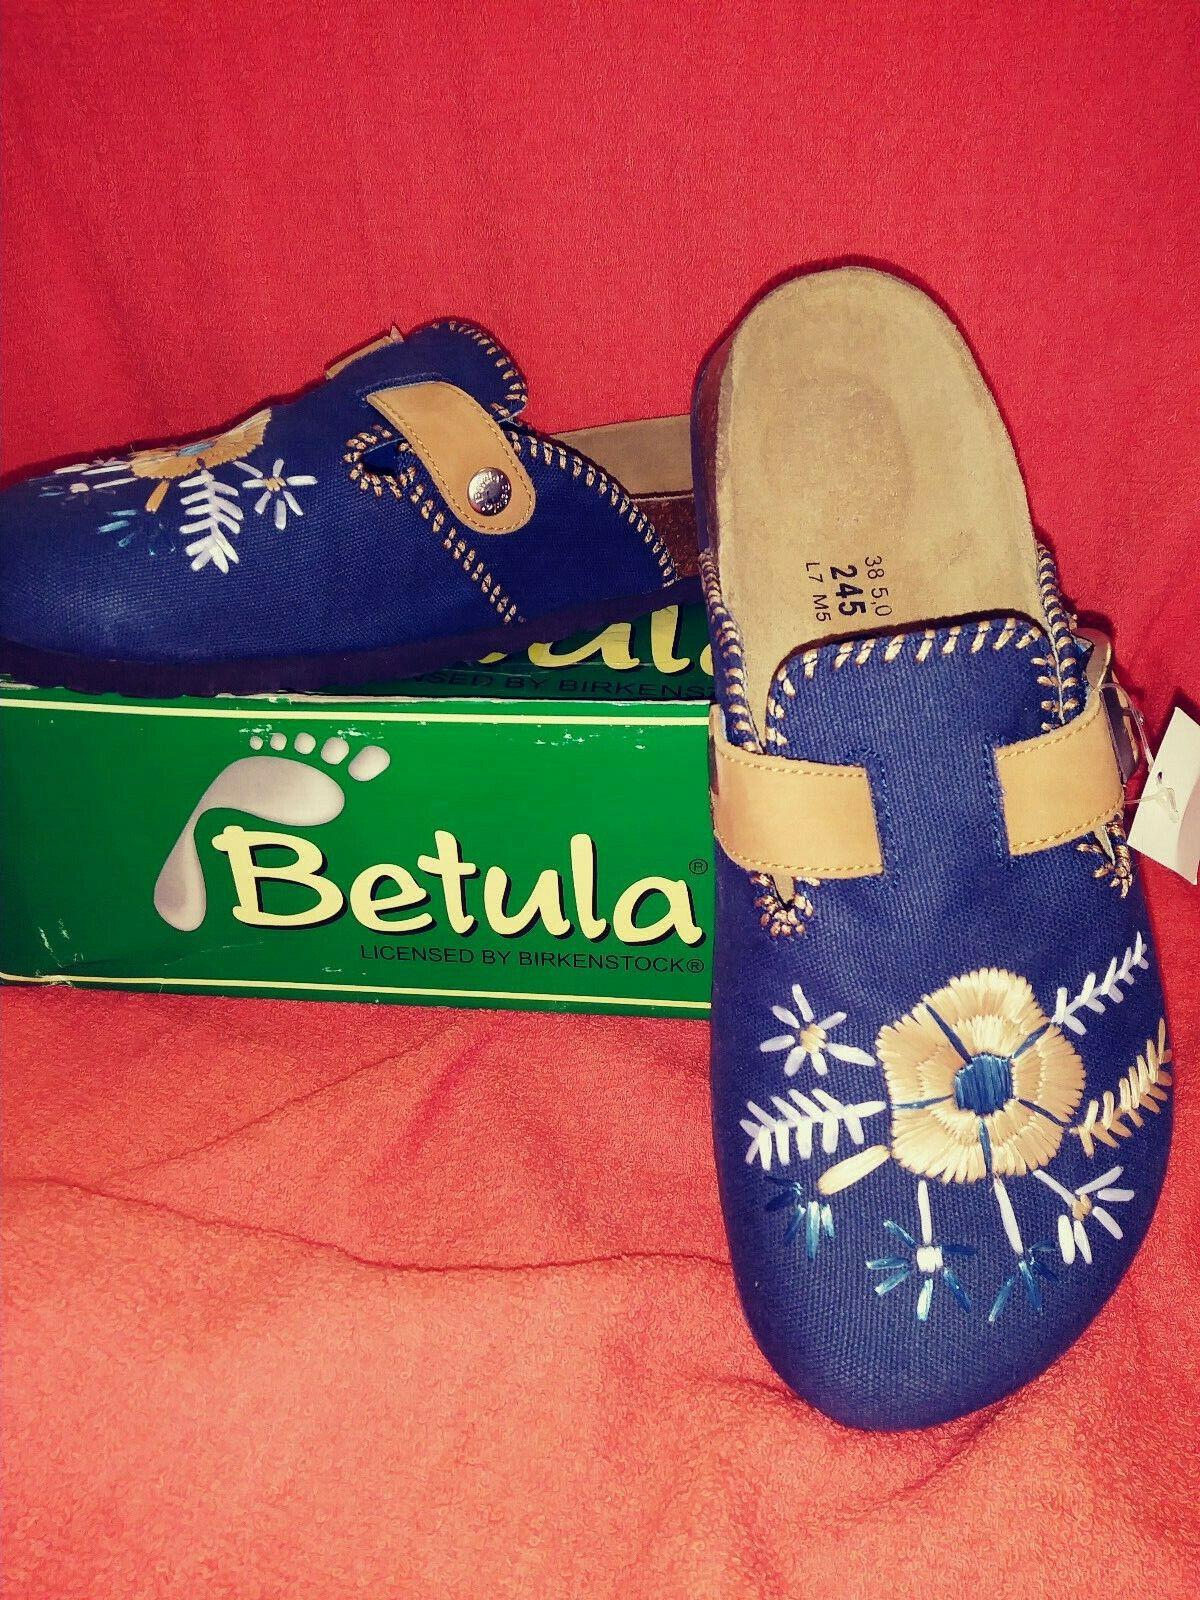 Betula Textile Multi blå Clog Sandals. Sandals. Sandals.  köpa rabatter